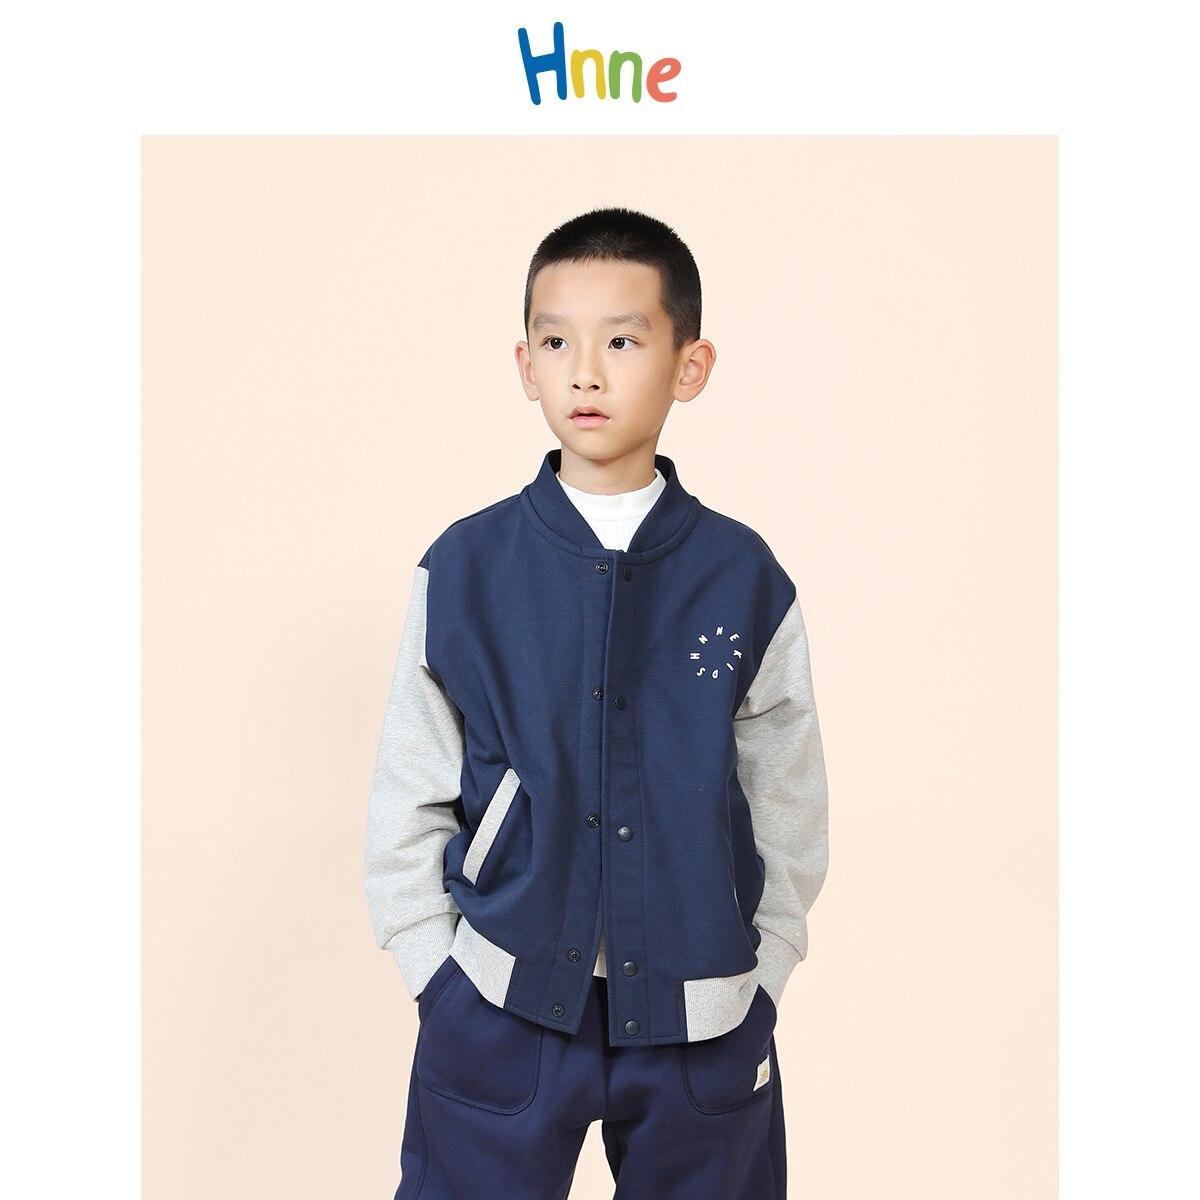 Hnne 2021 Autumn New Baseball Jackets Children 100% Cotton Contrast Color Bomber Coats Unisex Boys Girls Outerwear